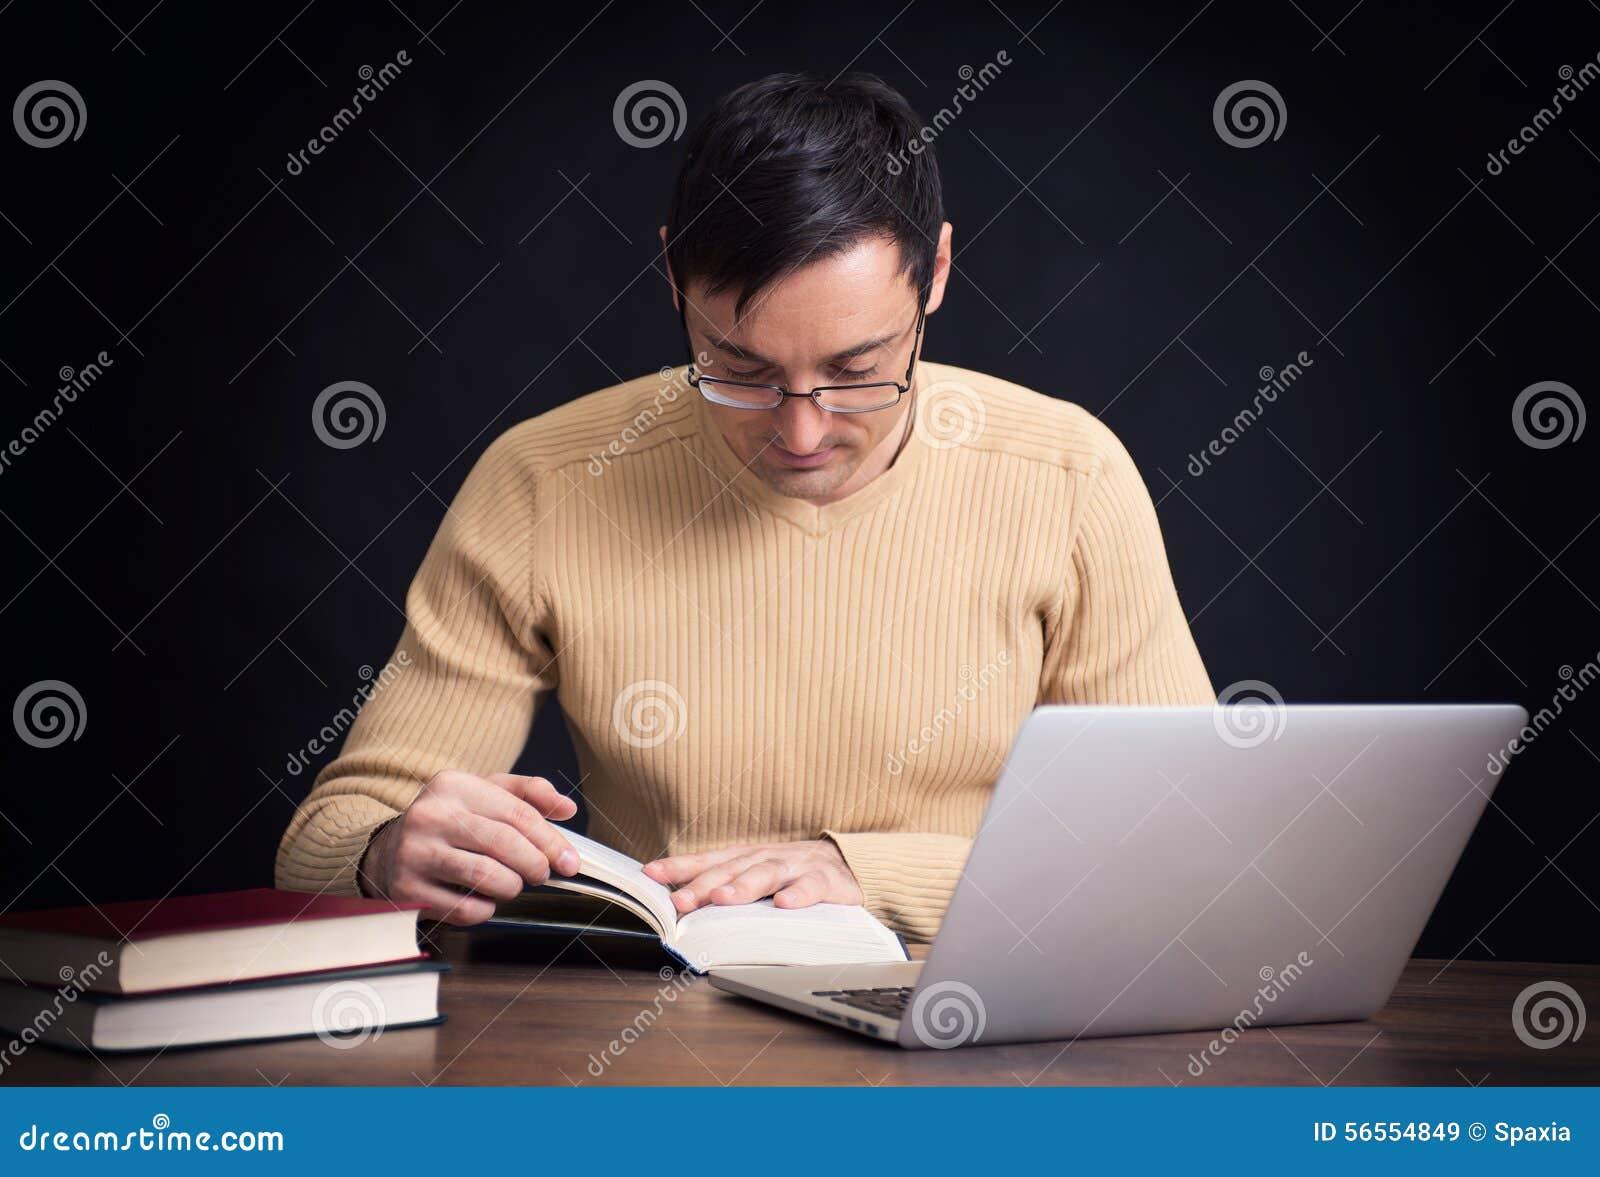 Download Χαμογελώντας όμορφο άτομο που διαβάζει ένα βιβλίο Στοκ Εικόνα - εικόνα από ανασκόπησης, εκπαίδευση: 56554849